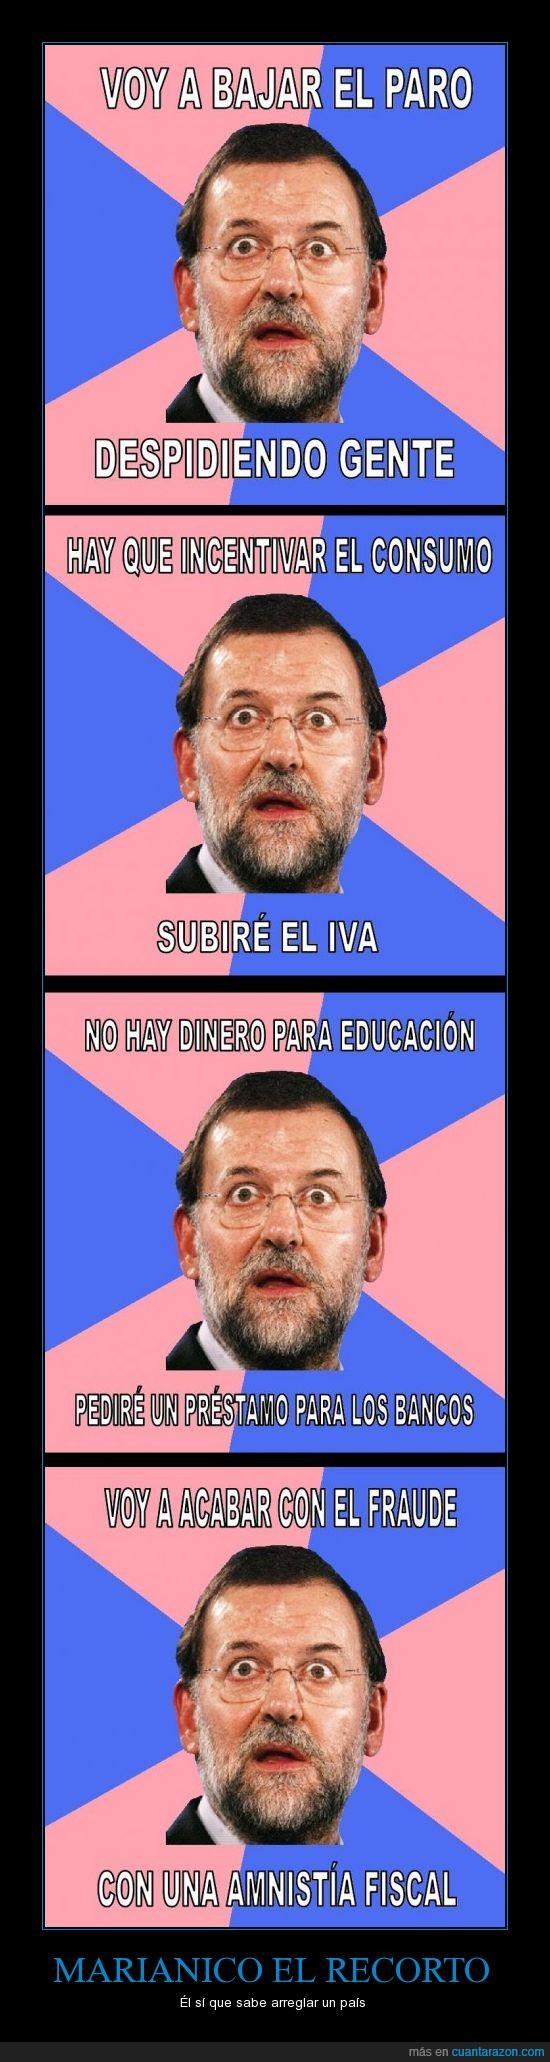 inteligencia,Marianico,Rajoy,Recorto